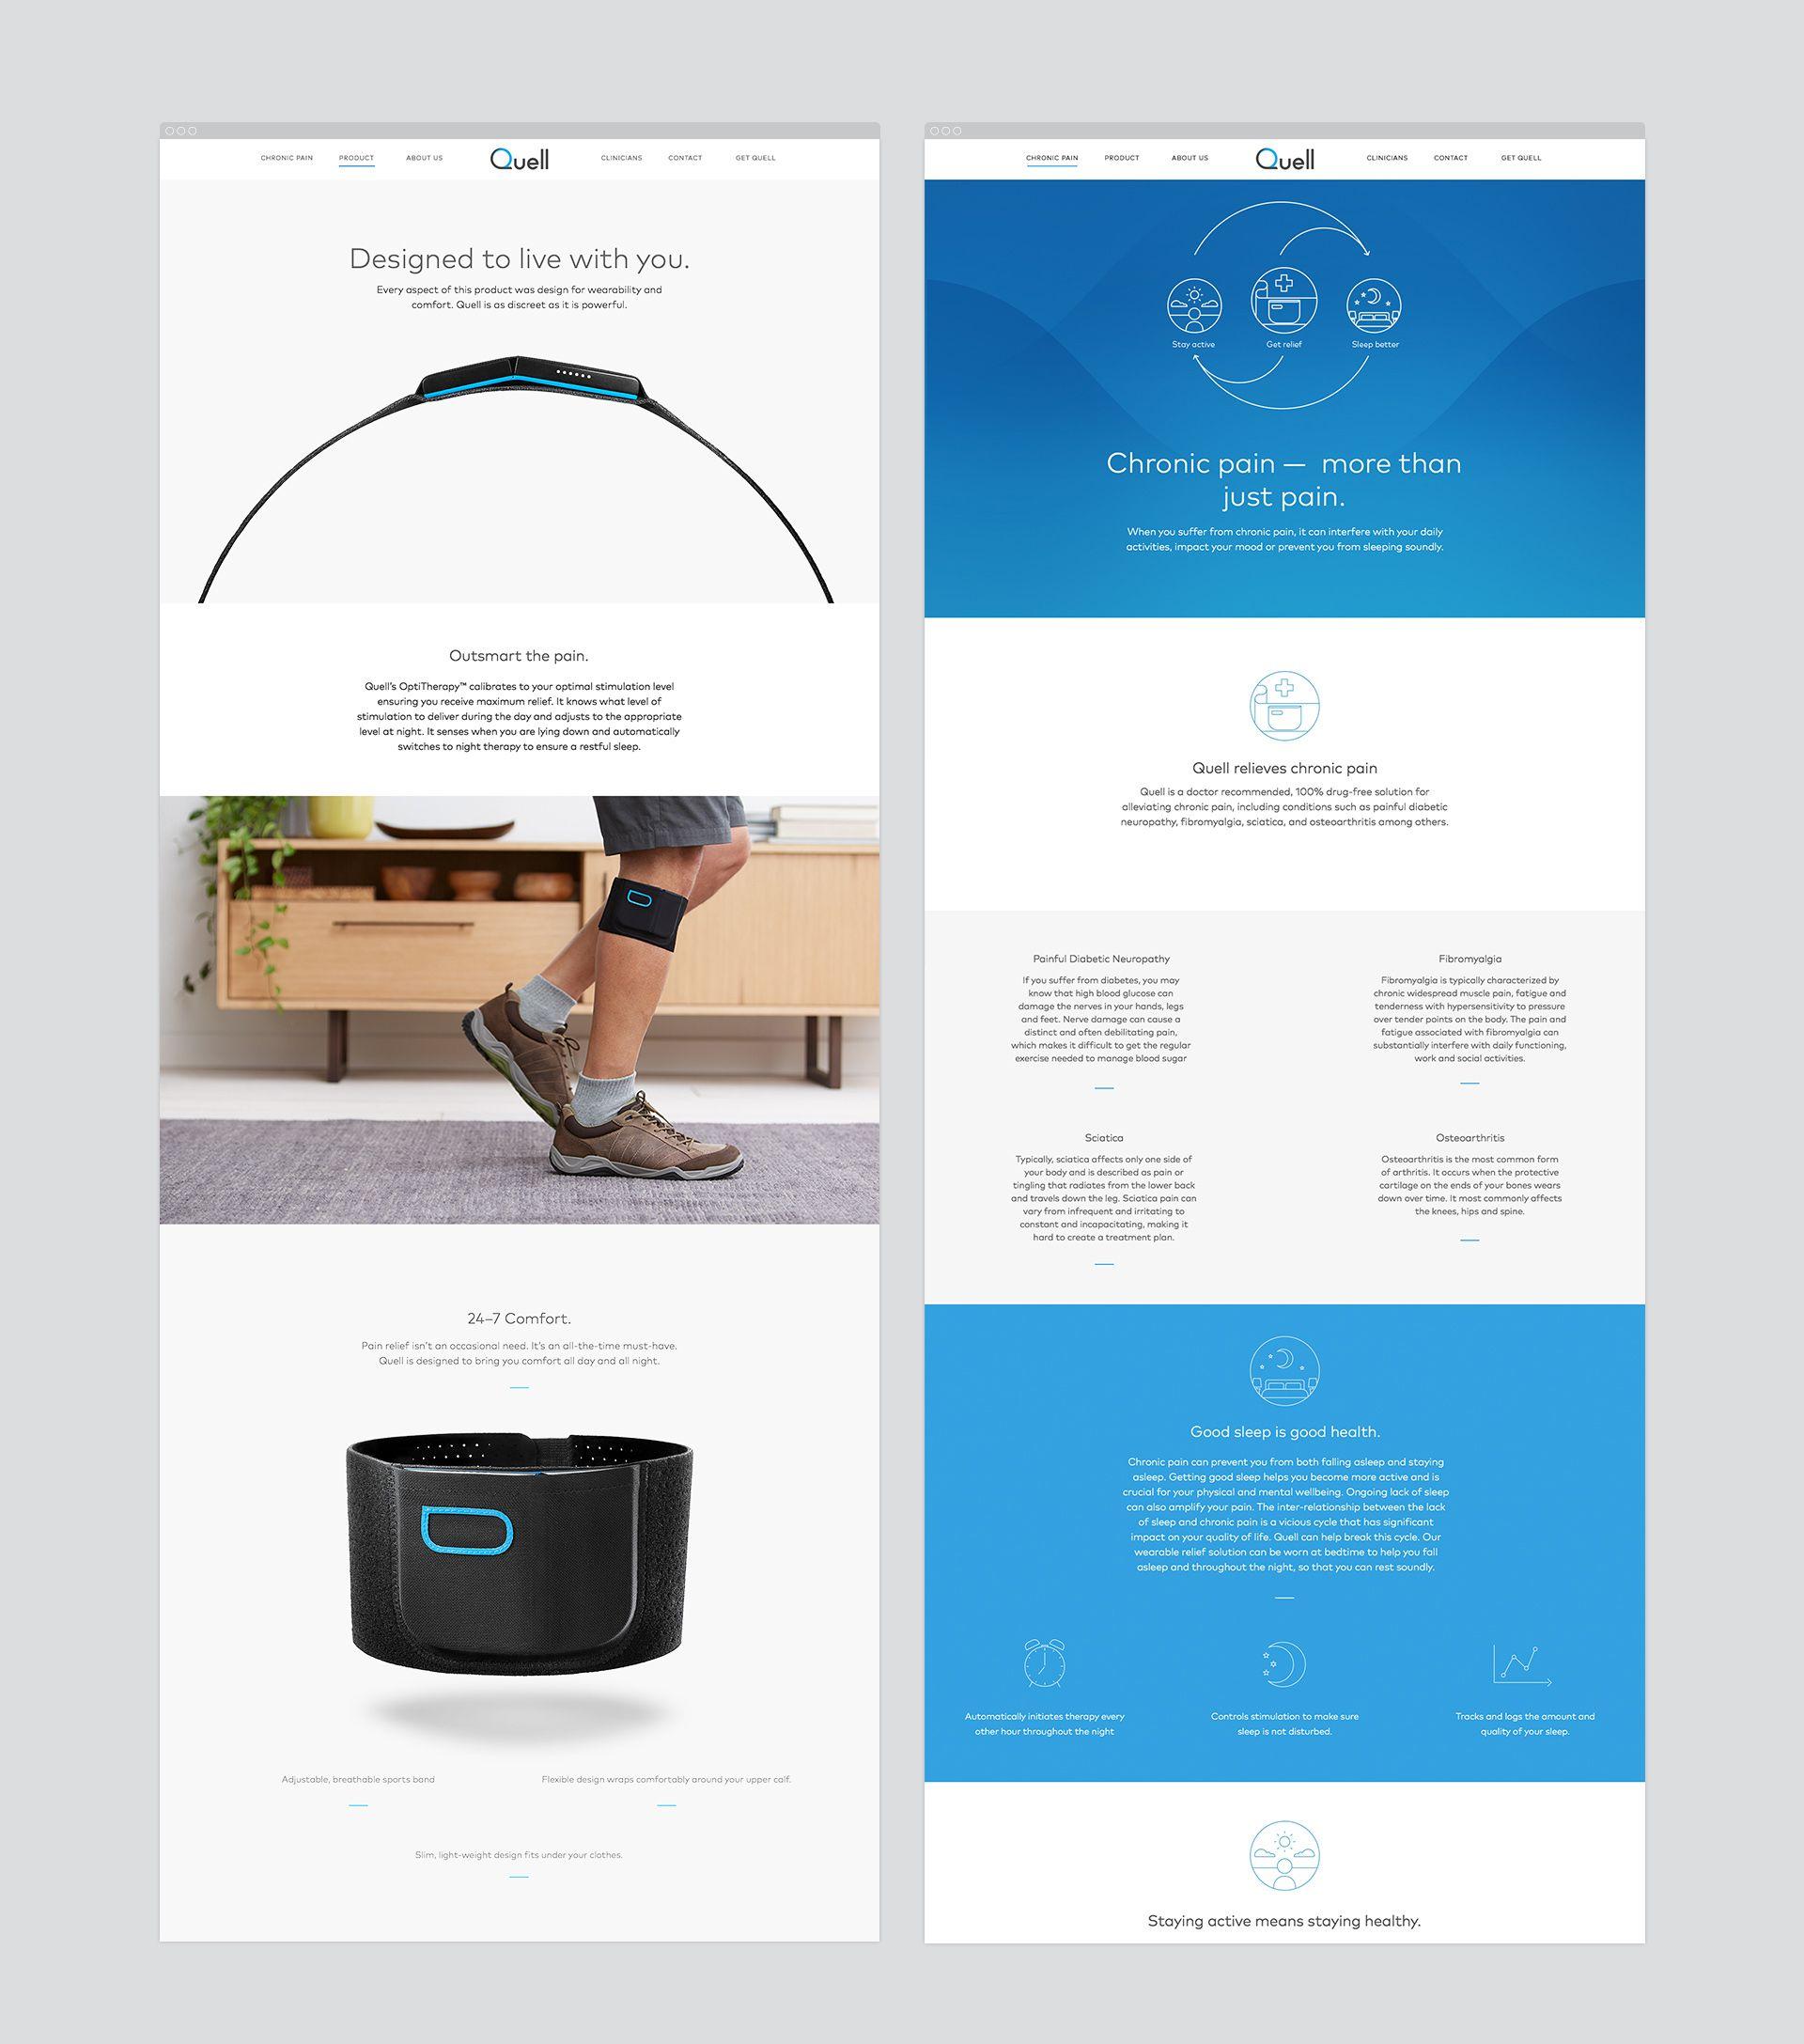 Quell Web Double 4 Jpg 1920 2175 Web Design Web Design Inspiration